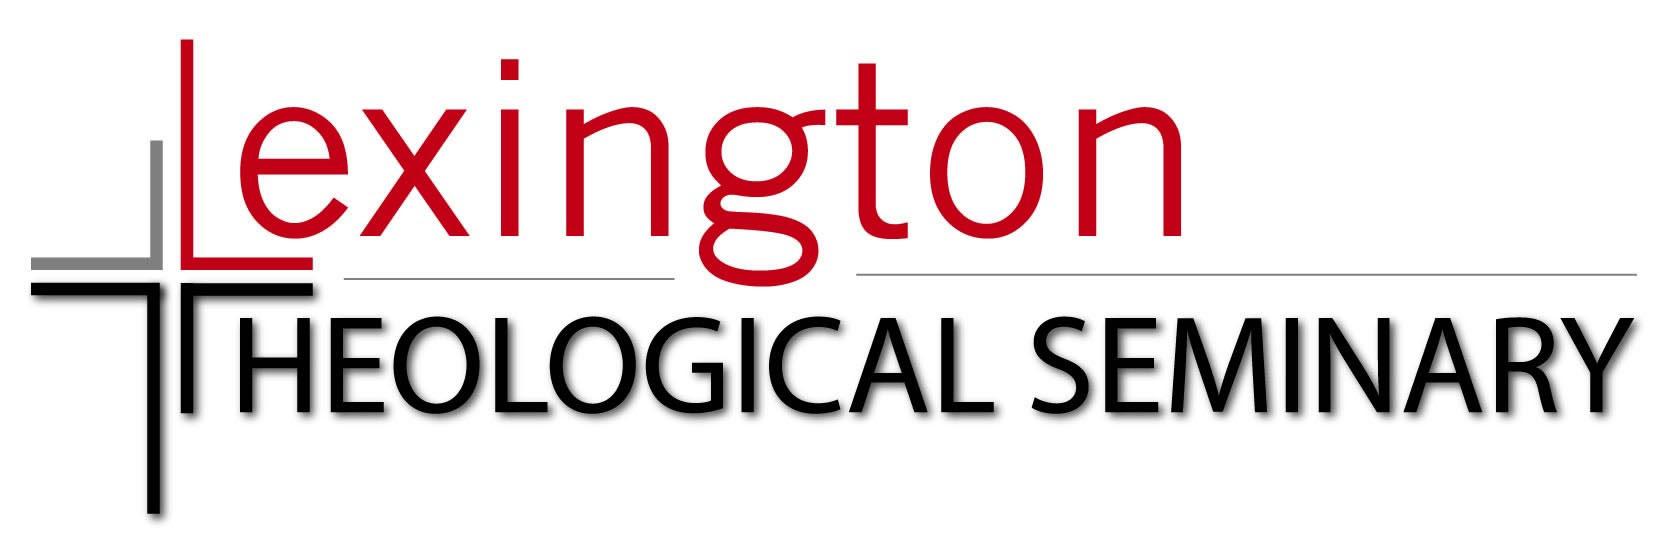 Lexington Theological Seminary logo